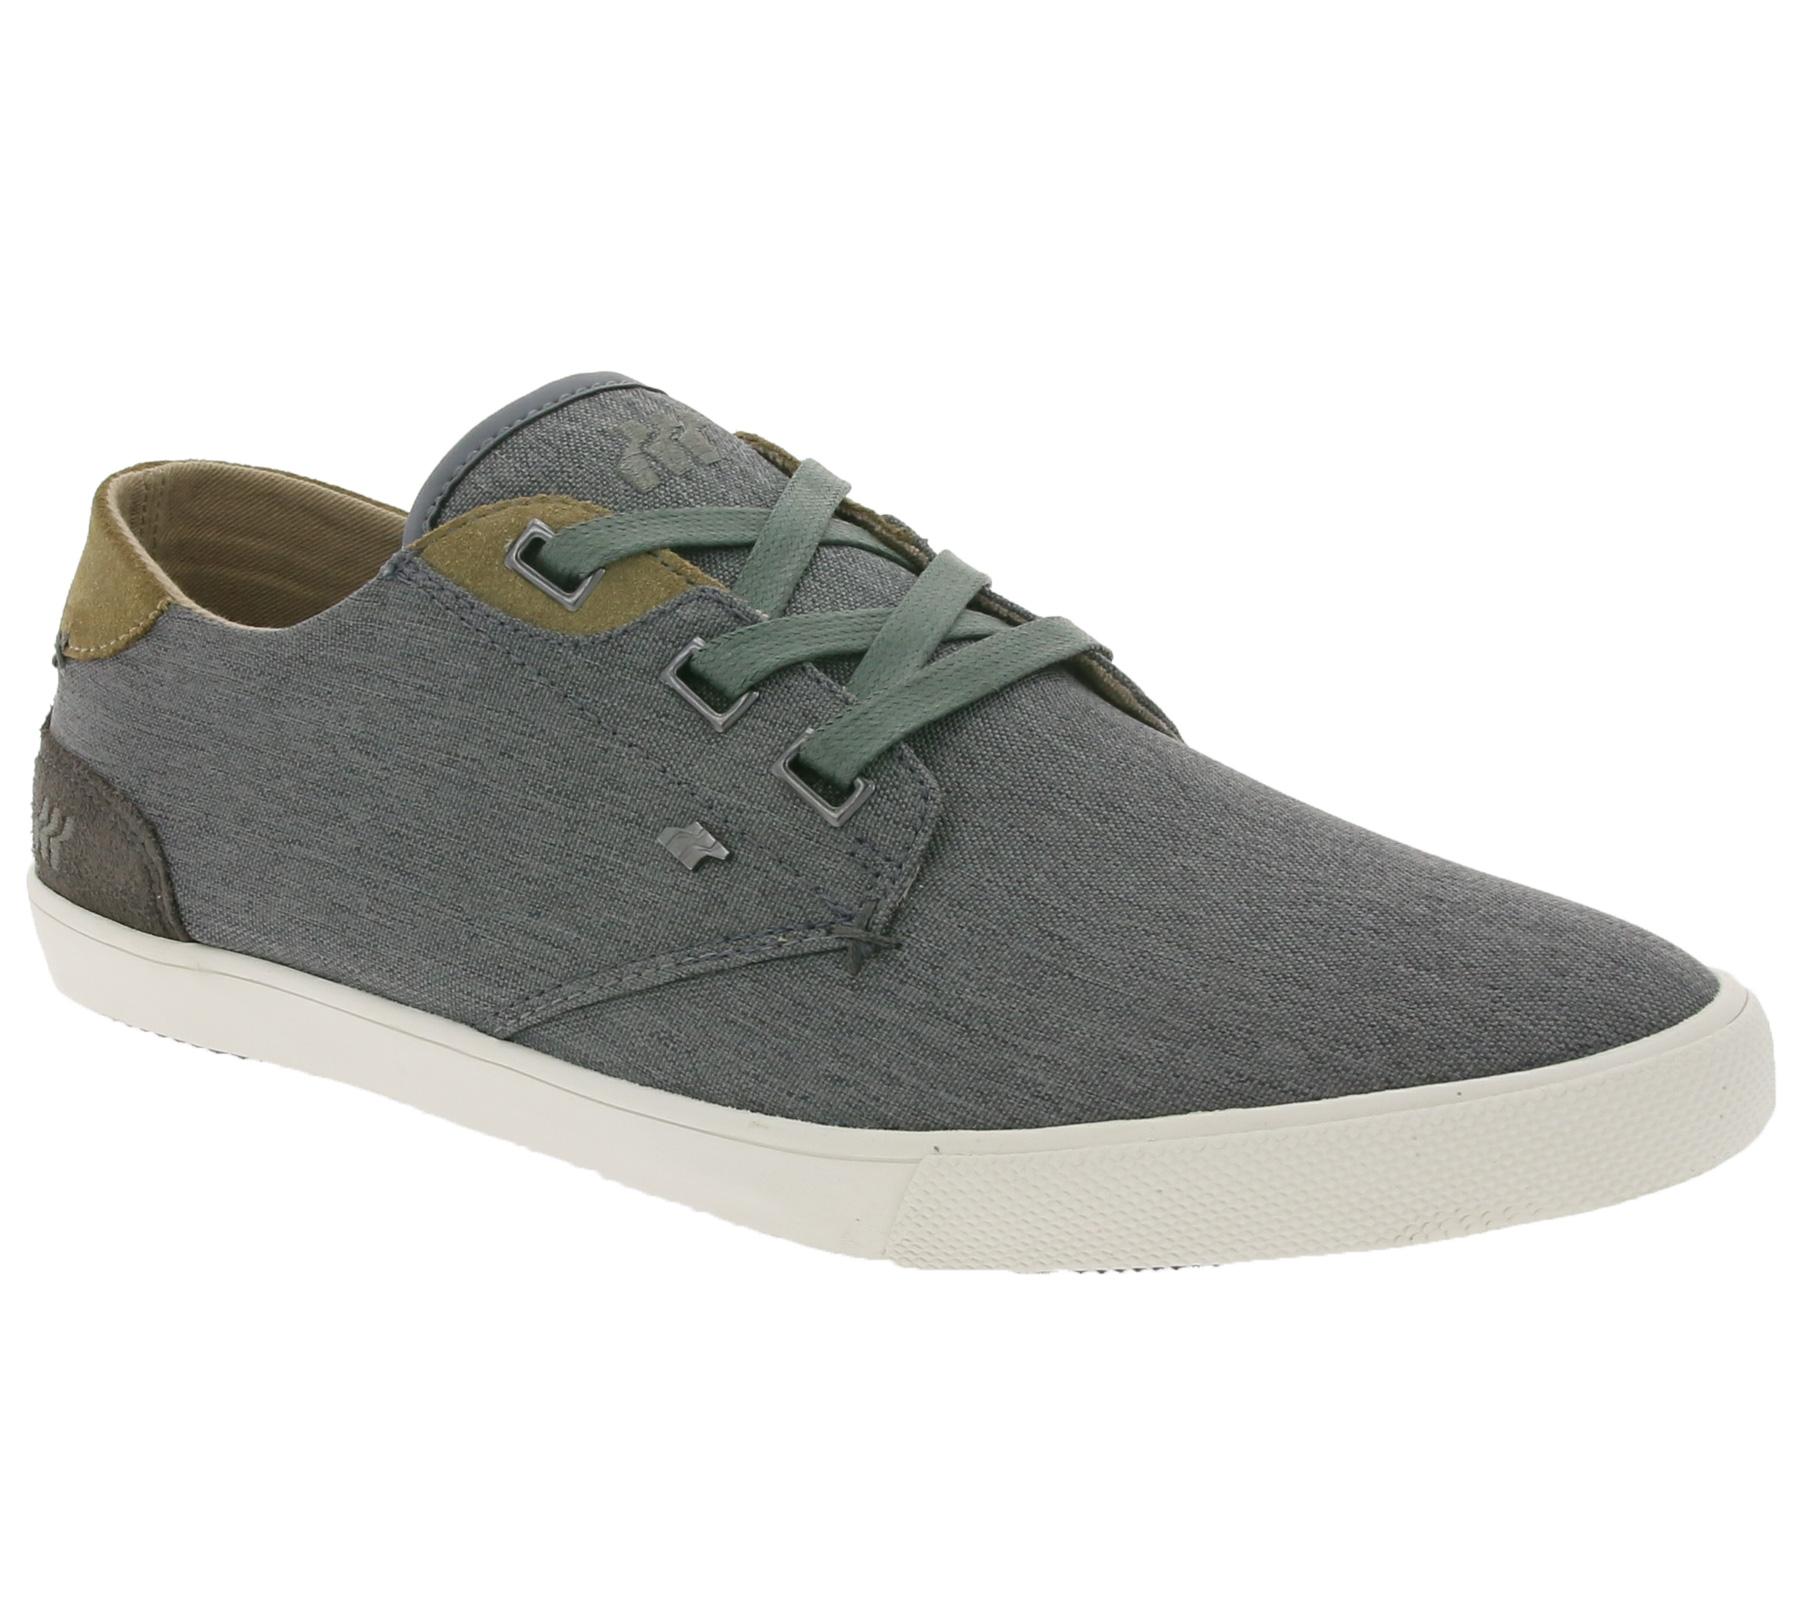 Boxfresh Schuhe bequeme Herren Low-Top Sneaker Turn-Schuhe Freizeit-Schuhe Grau